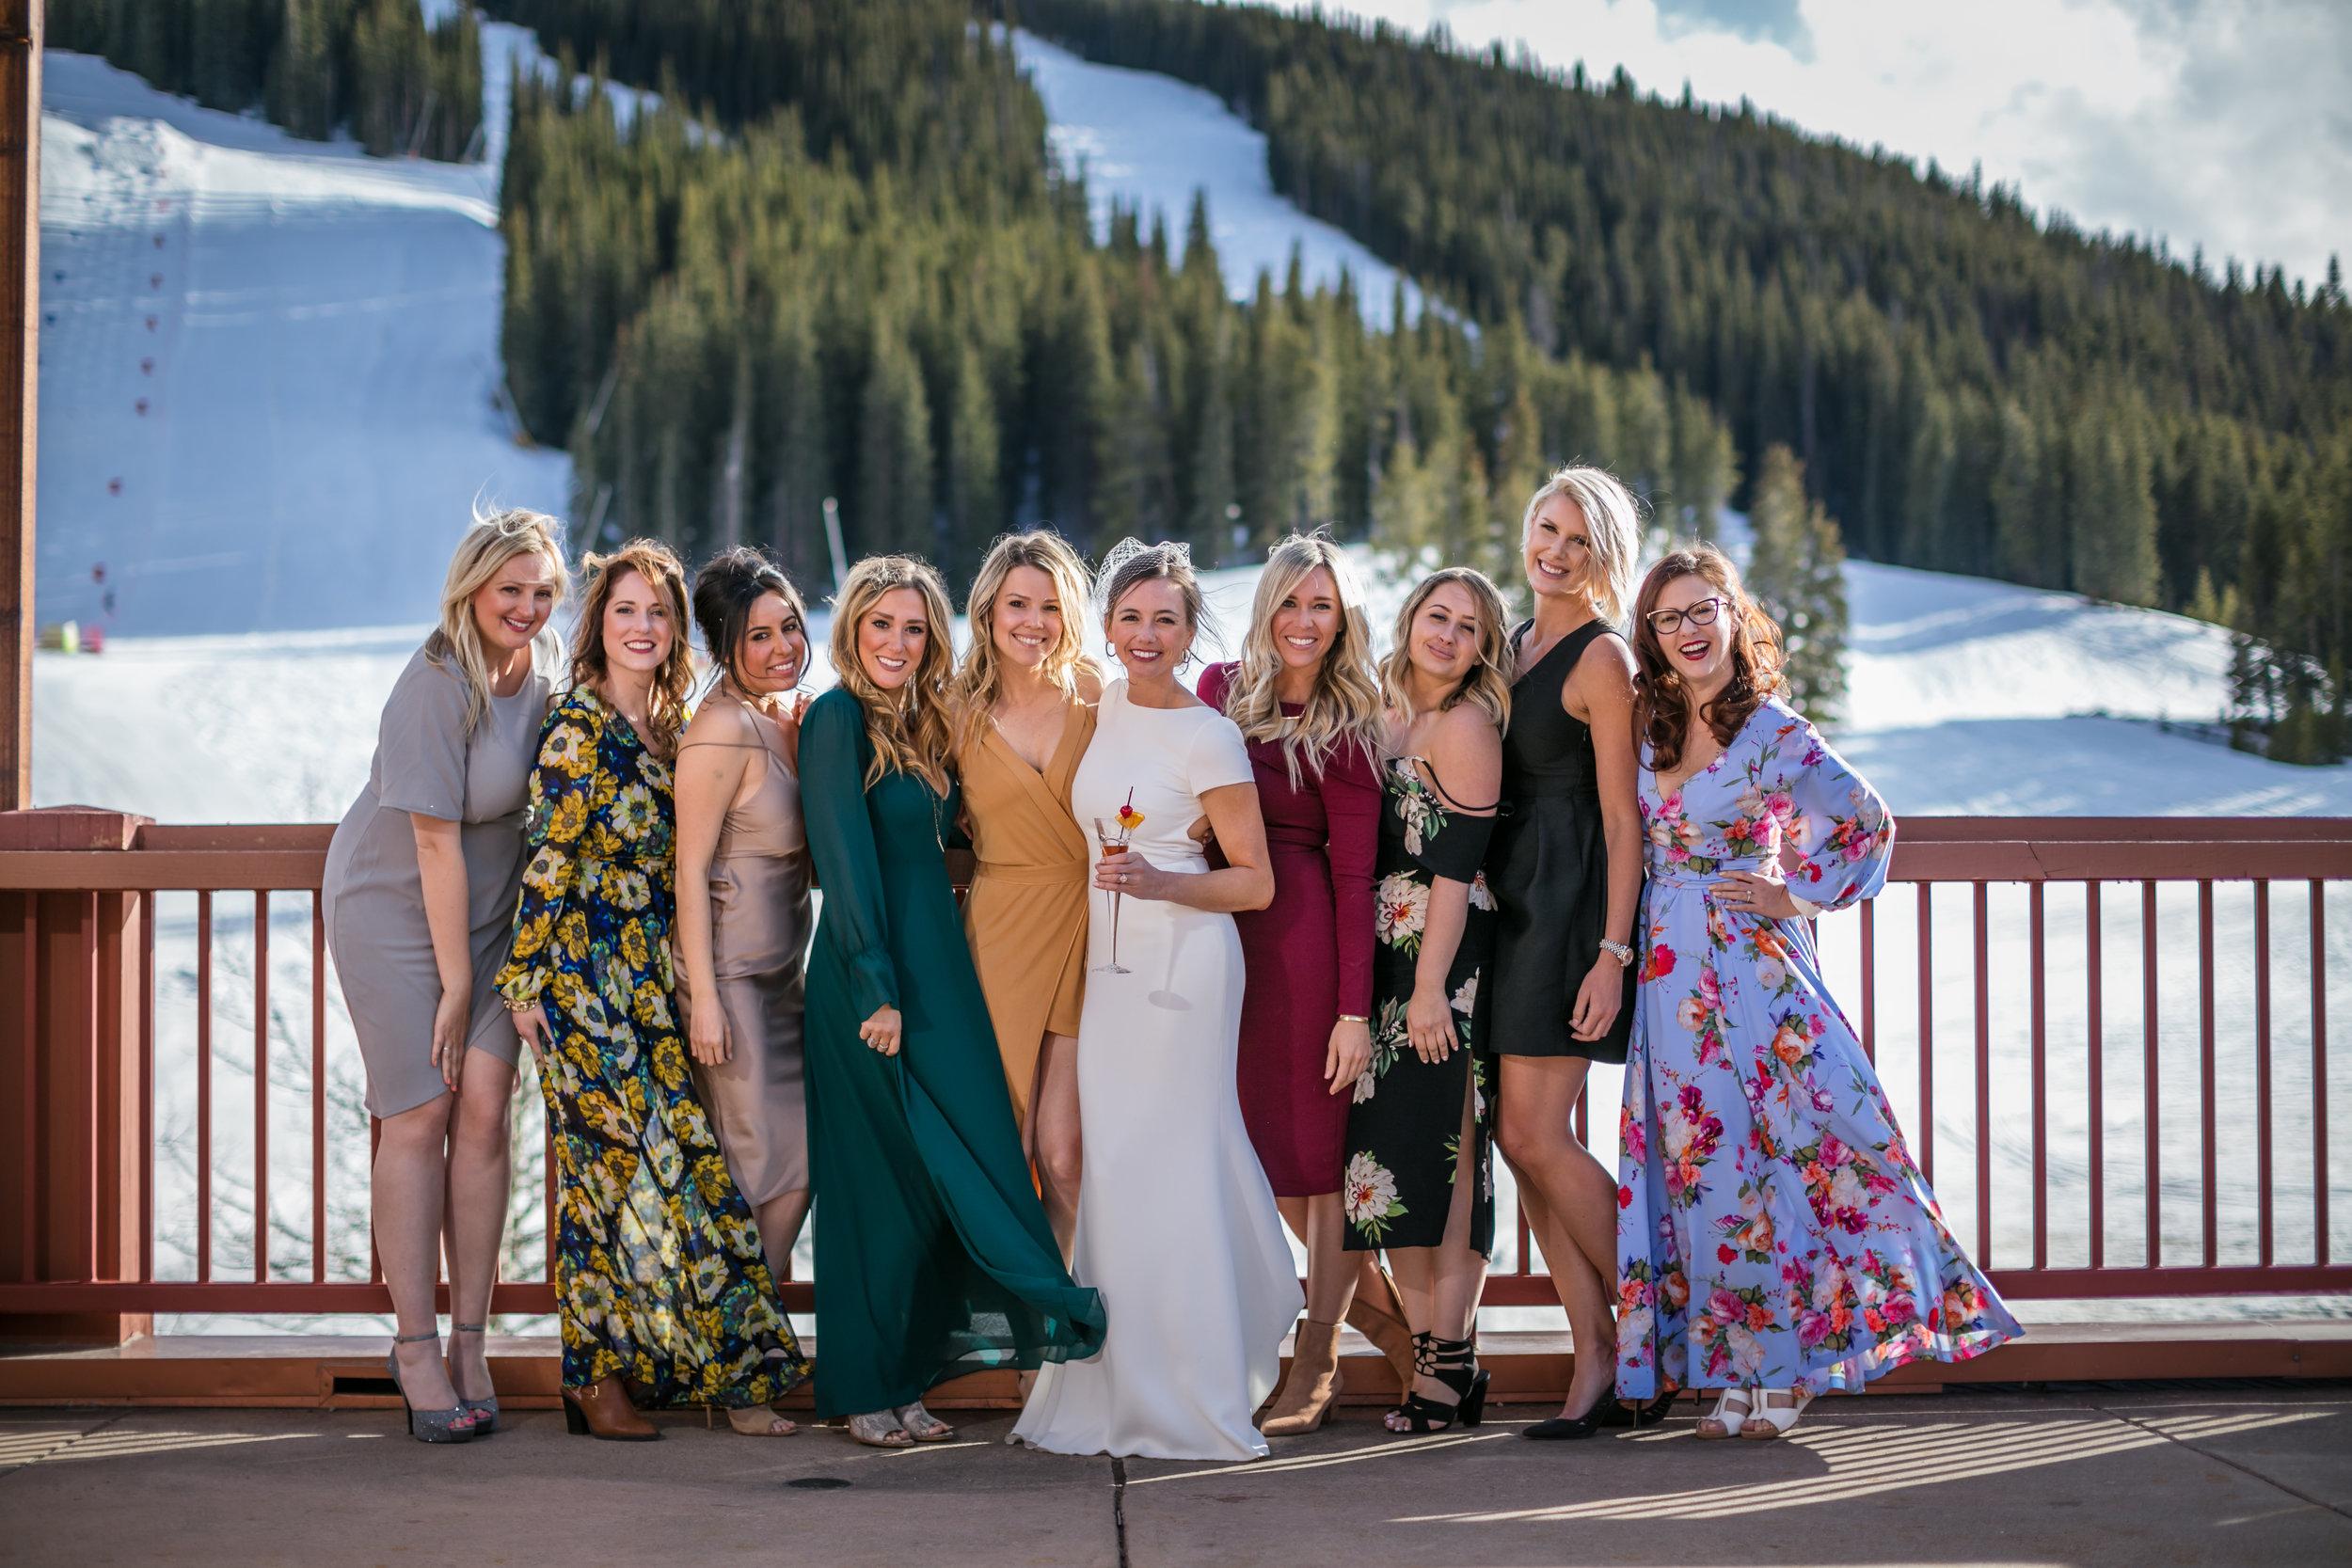 vild-photography-photographer-colorado-intimate-wedding-adventure-Stephanie- Adam-520.jpg